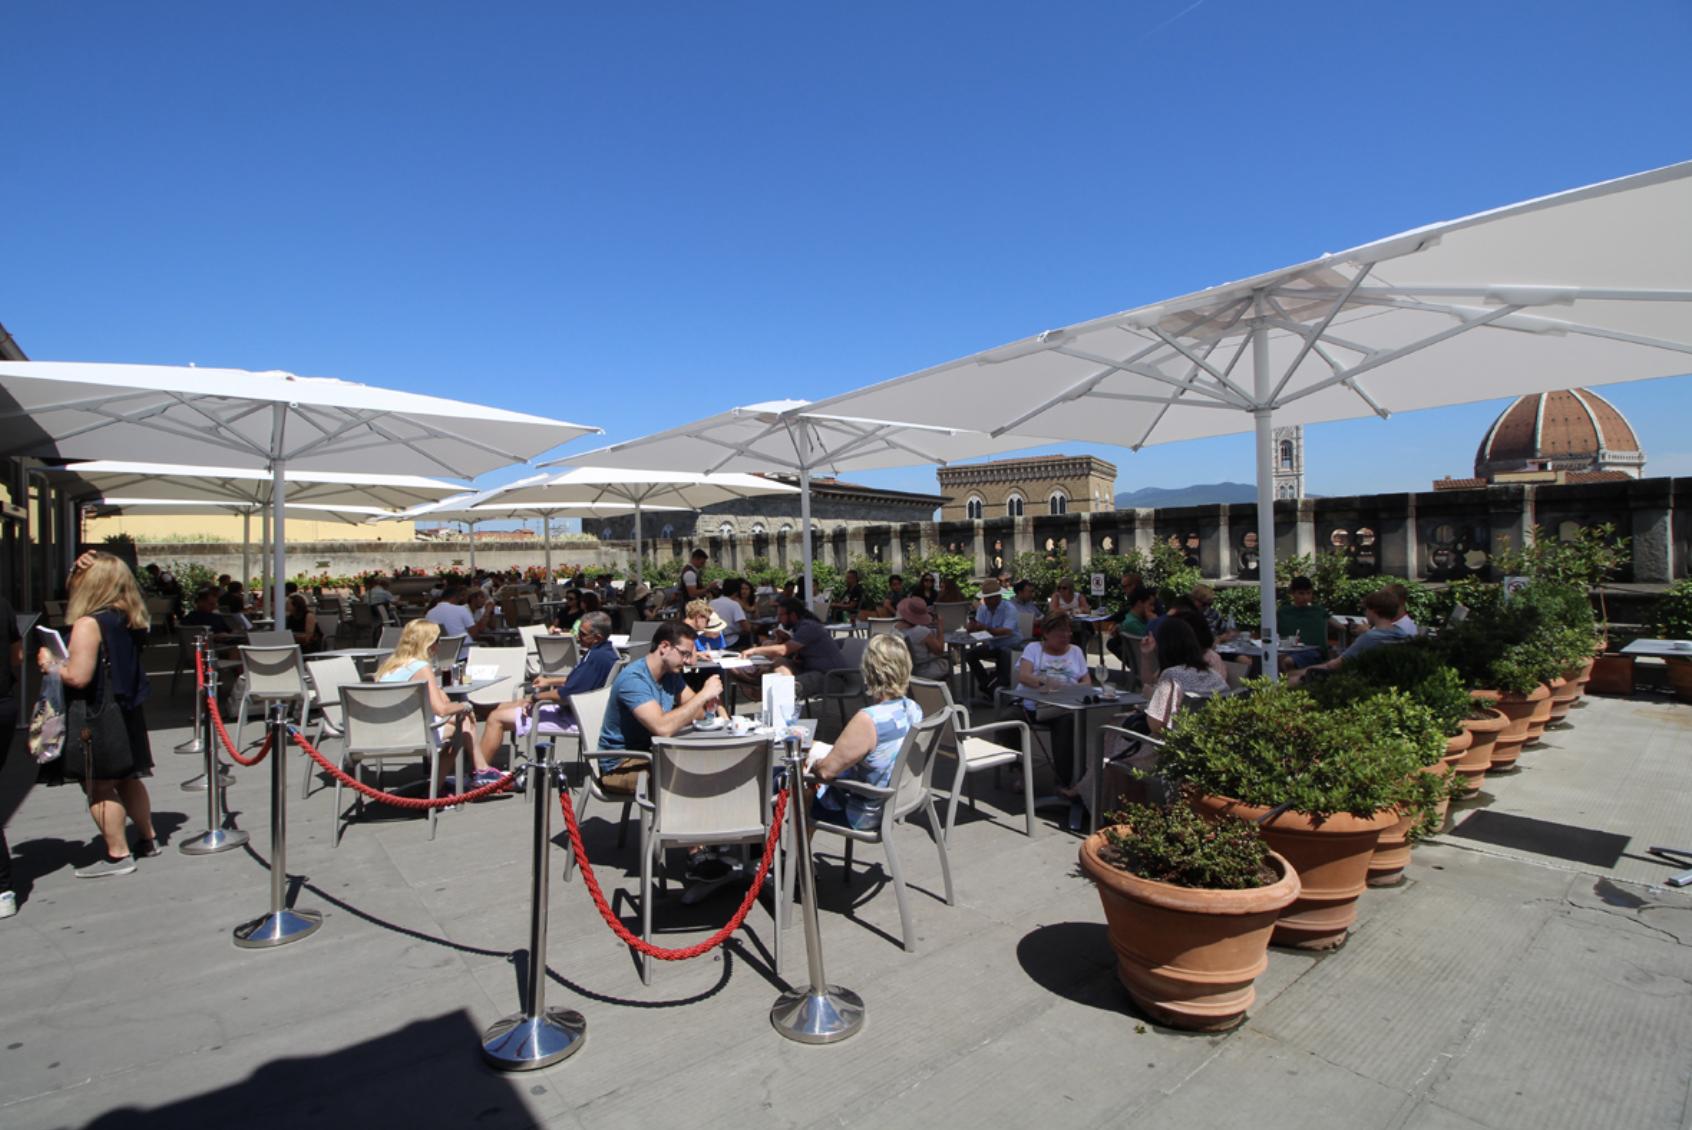 Uffizi Terrace — Coffee shop